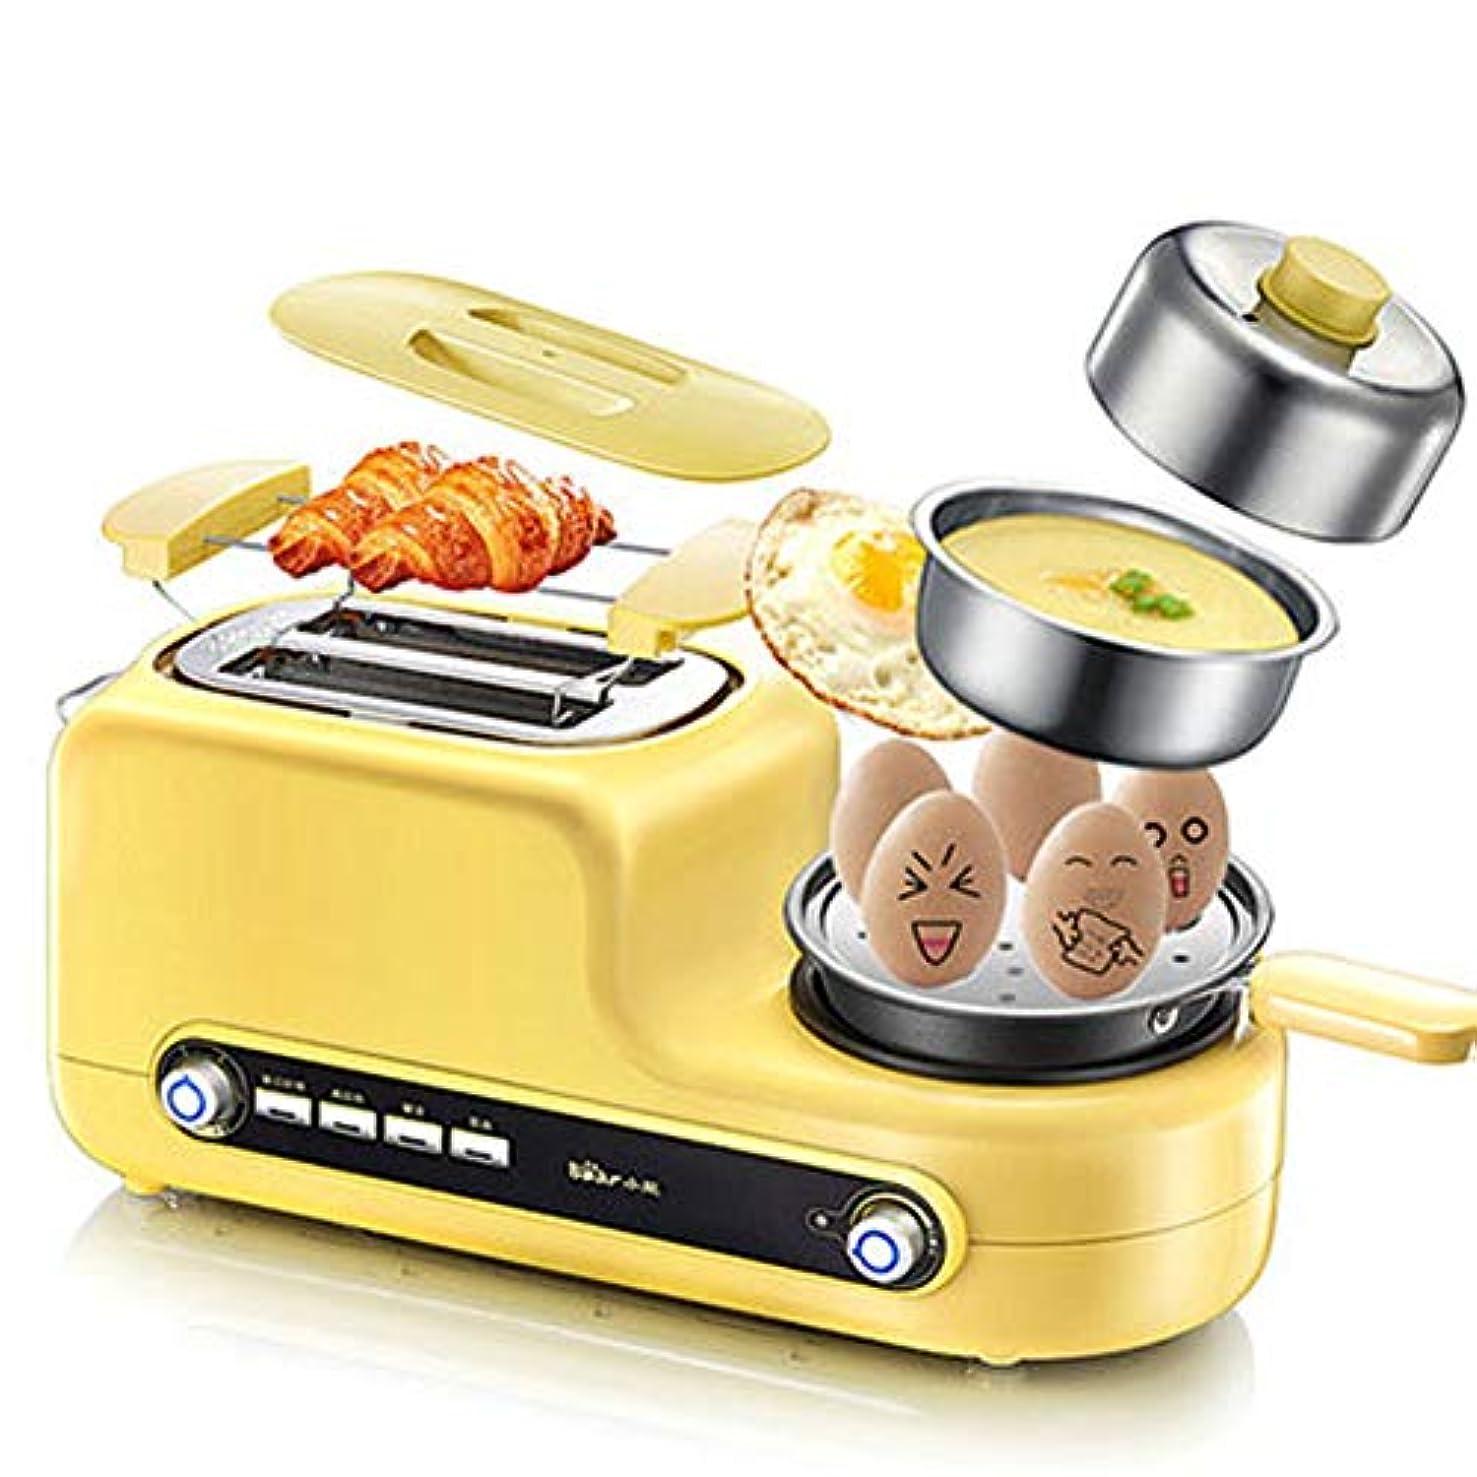 Egg Boilers Egg Cooker Steamed Egg Omelette Toaster Fried Roast Dual-use Household Breakfast Soil Driver Automatic Toast Artifact